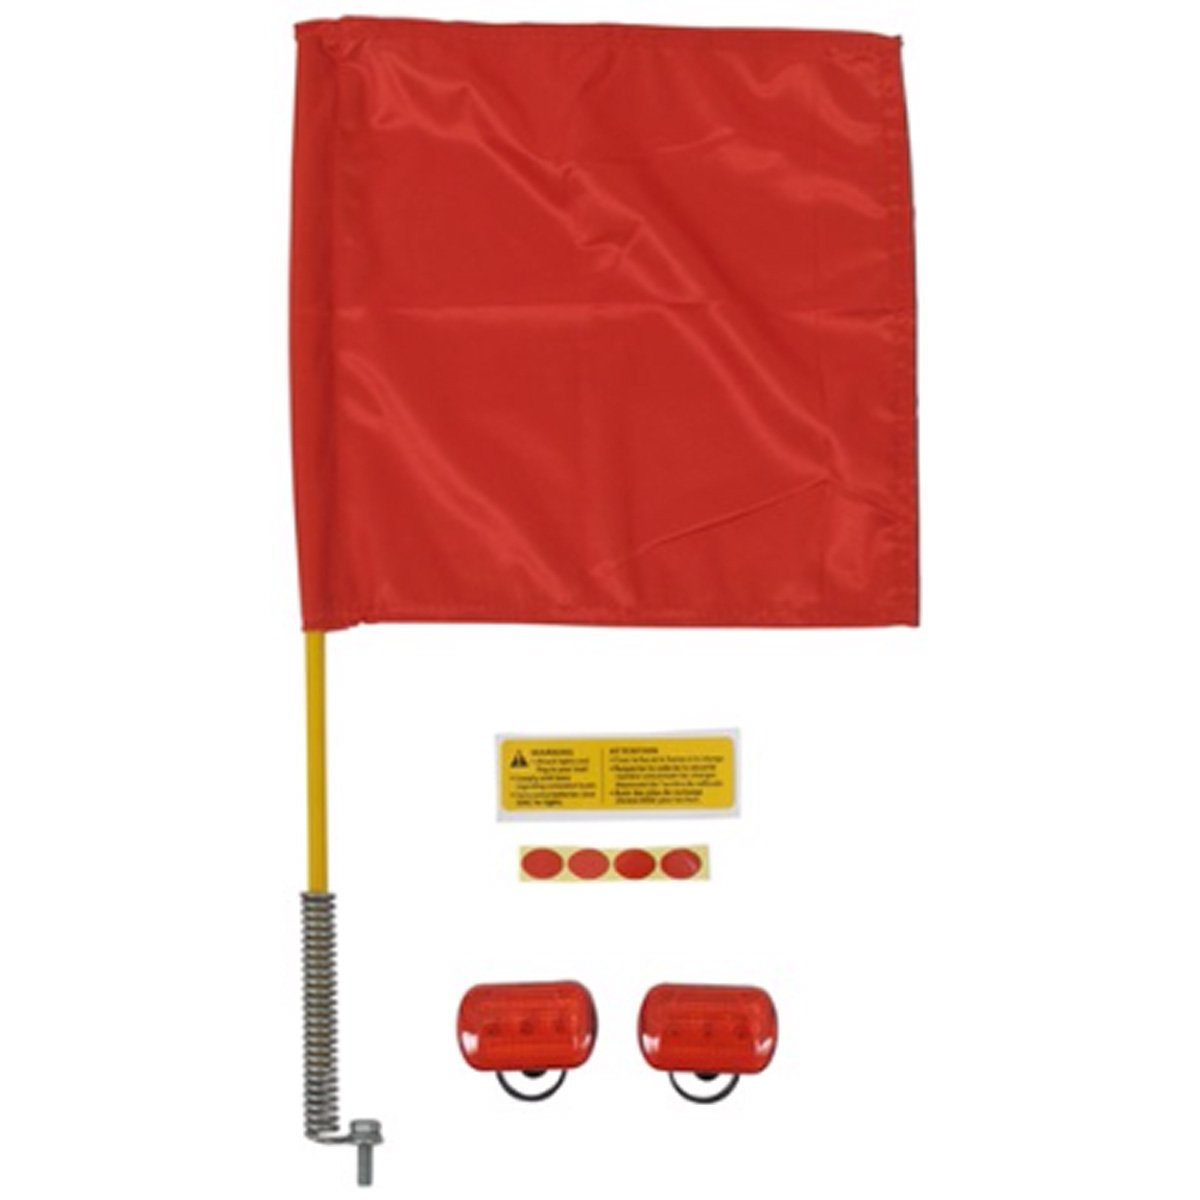 Yakima HoldUp Plus 2 Replacement Safety Kit - 8880206